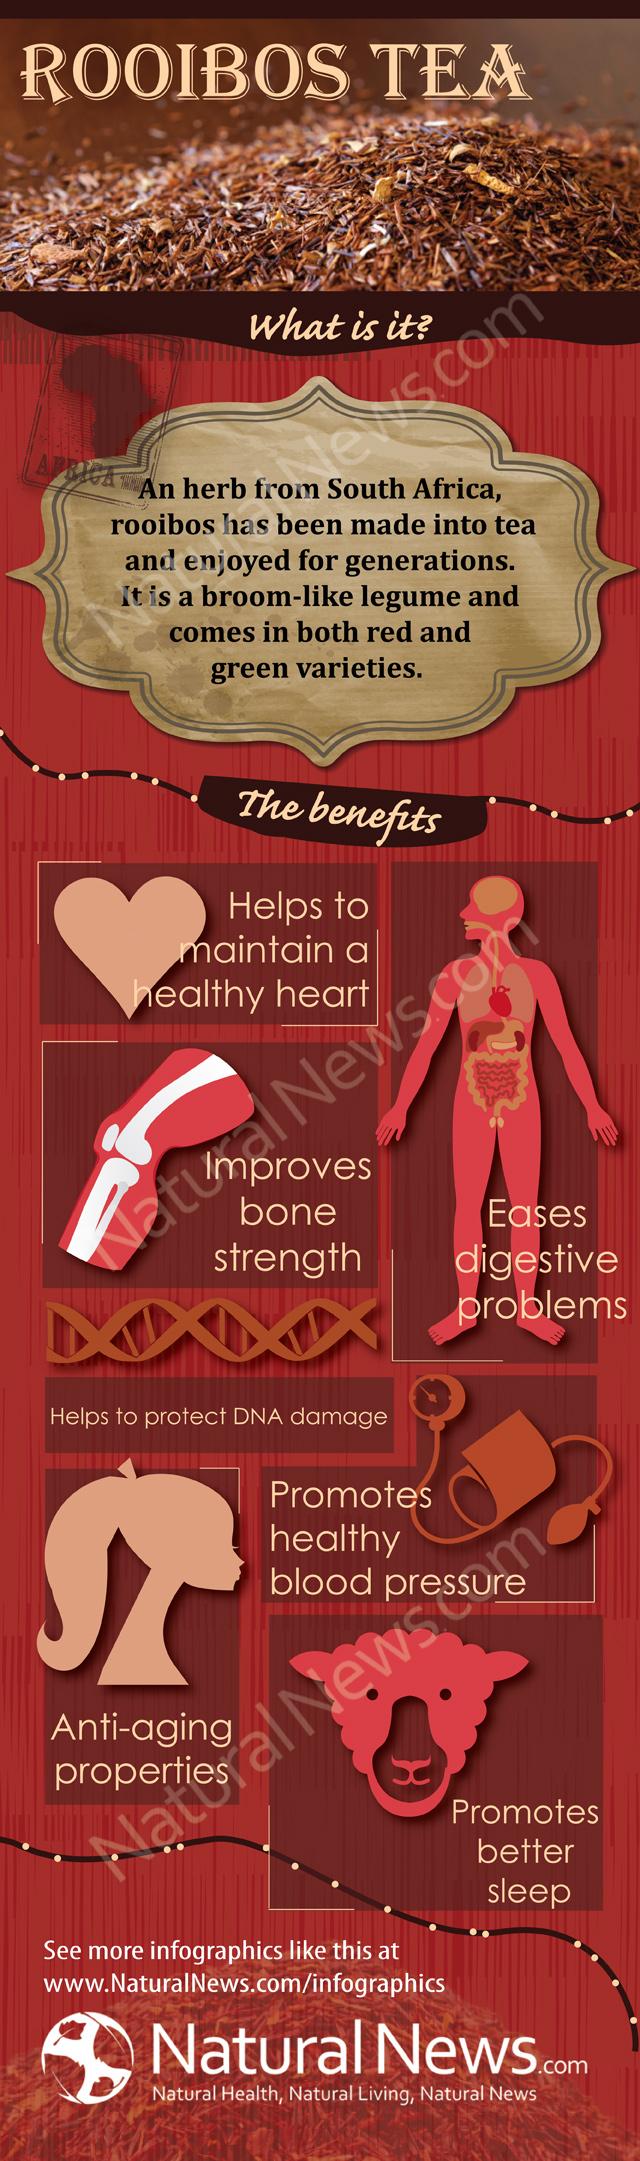 Benefits of Rooibos Tea